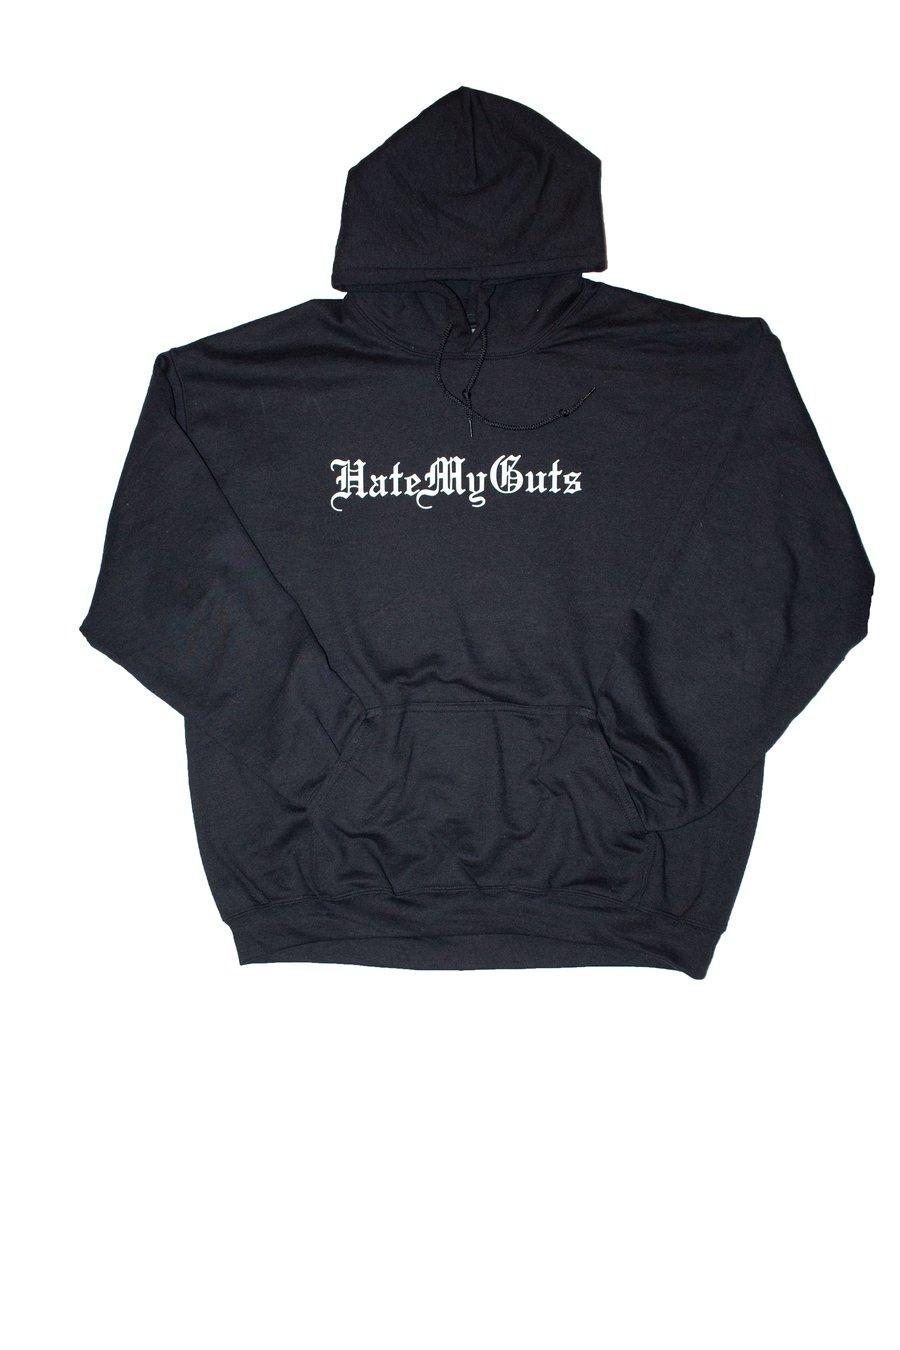 Image of HateMyGuts script hoodie